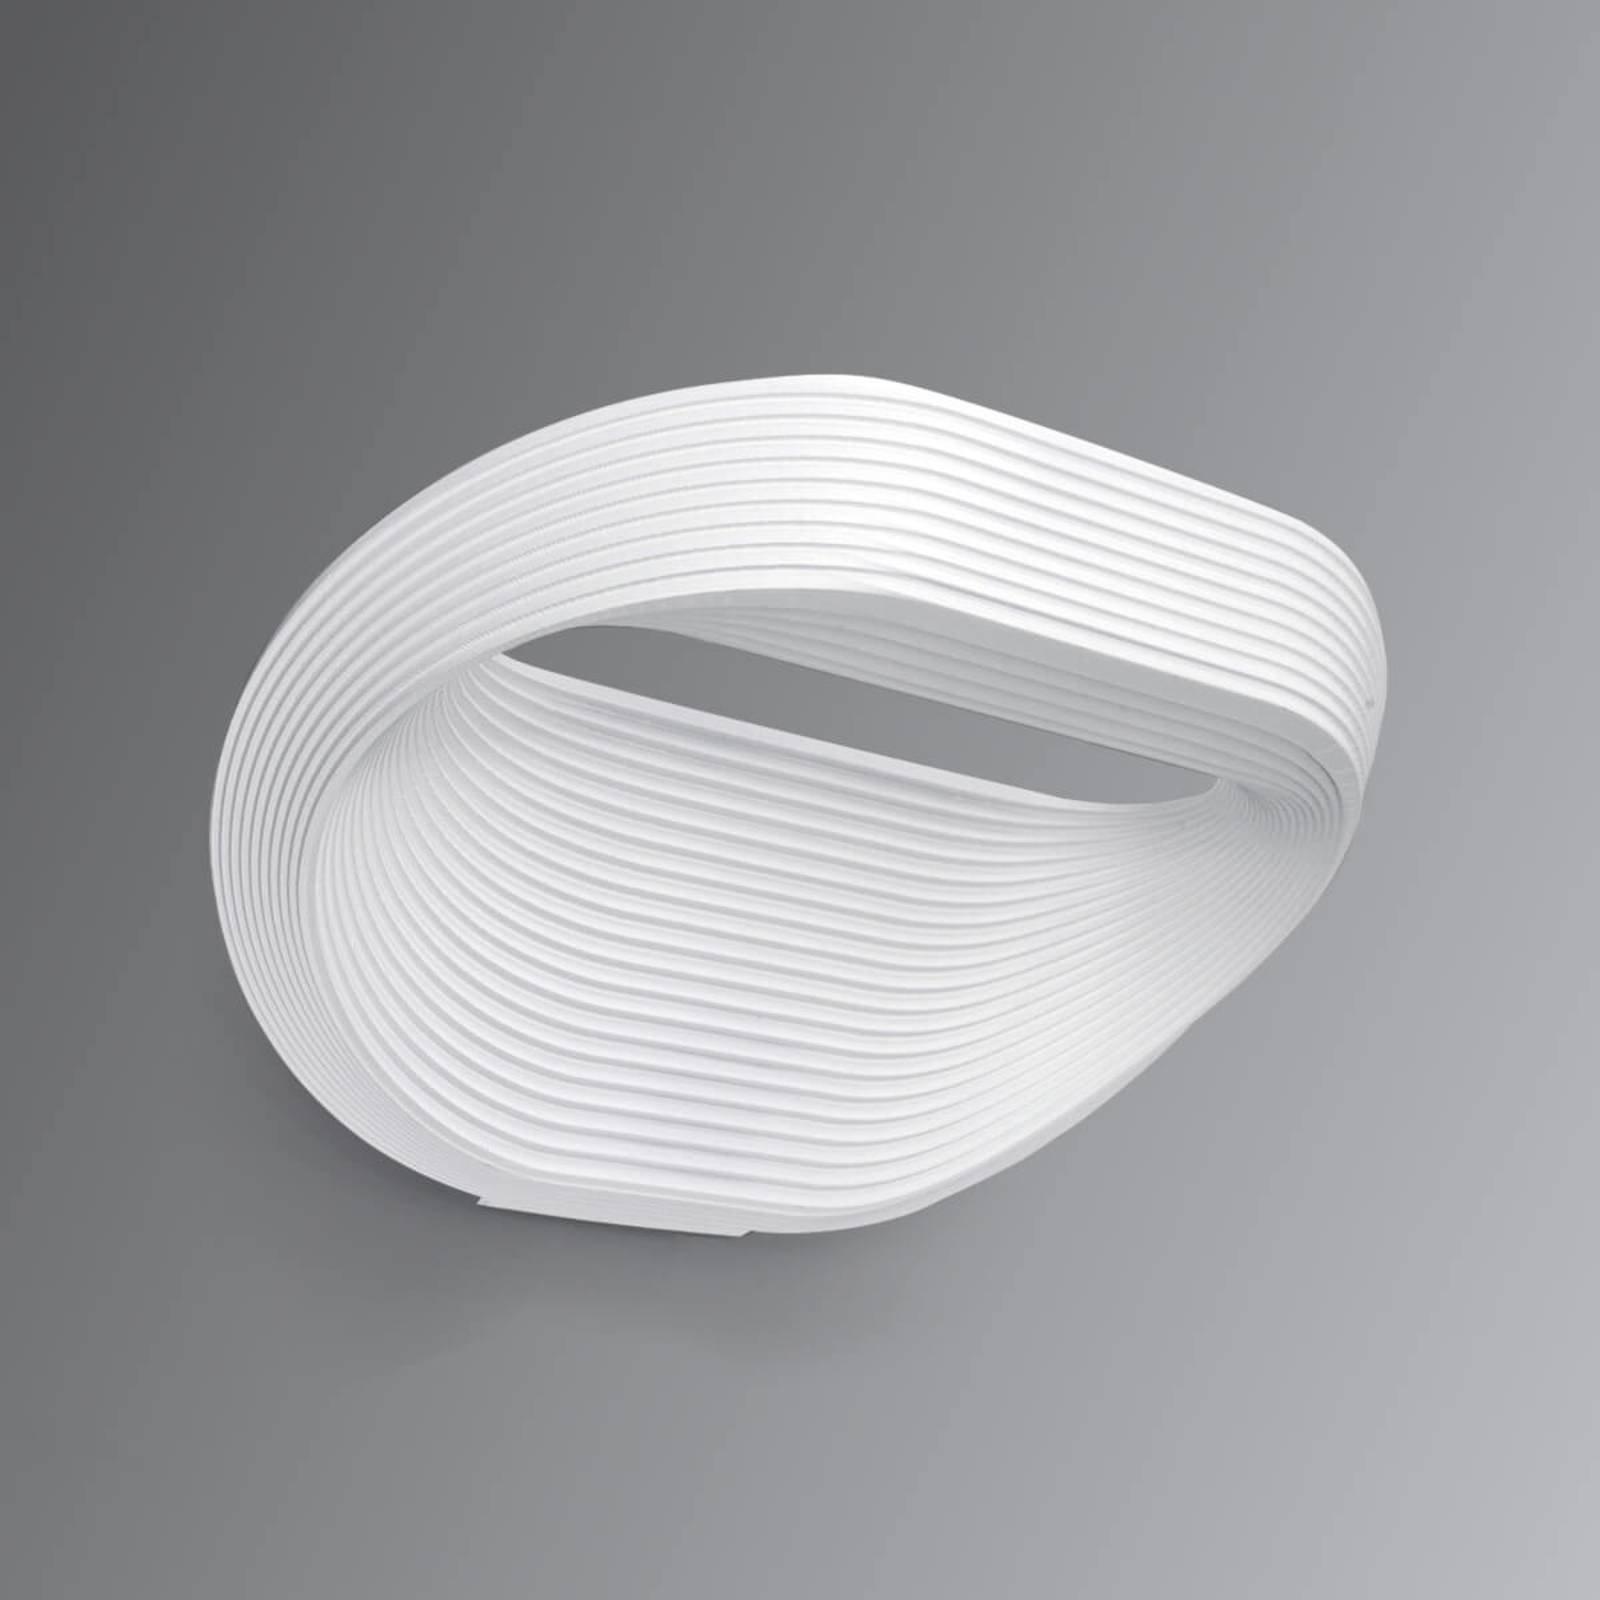 Cini&Nils Sestessa - hvit LED-vegglampe, 24 cm